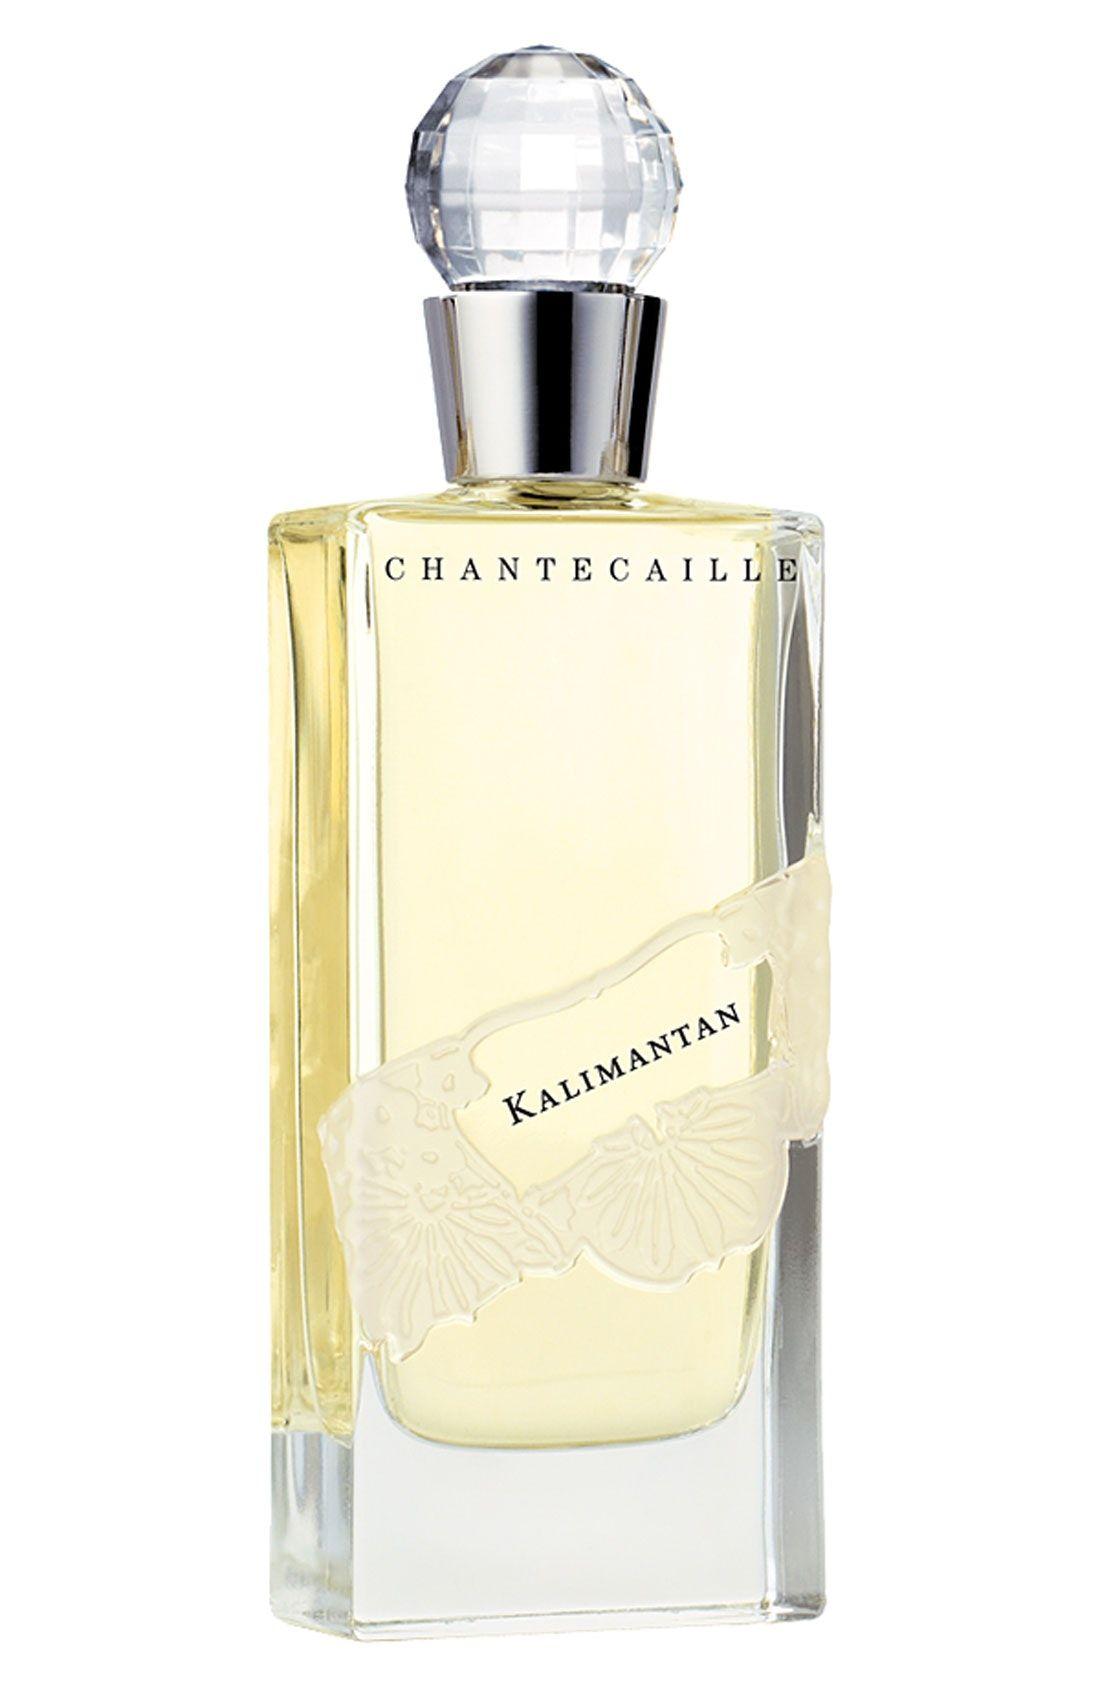 Abecedario de perfumes 794f4ab63fabe596cda4686c1831890f